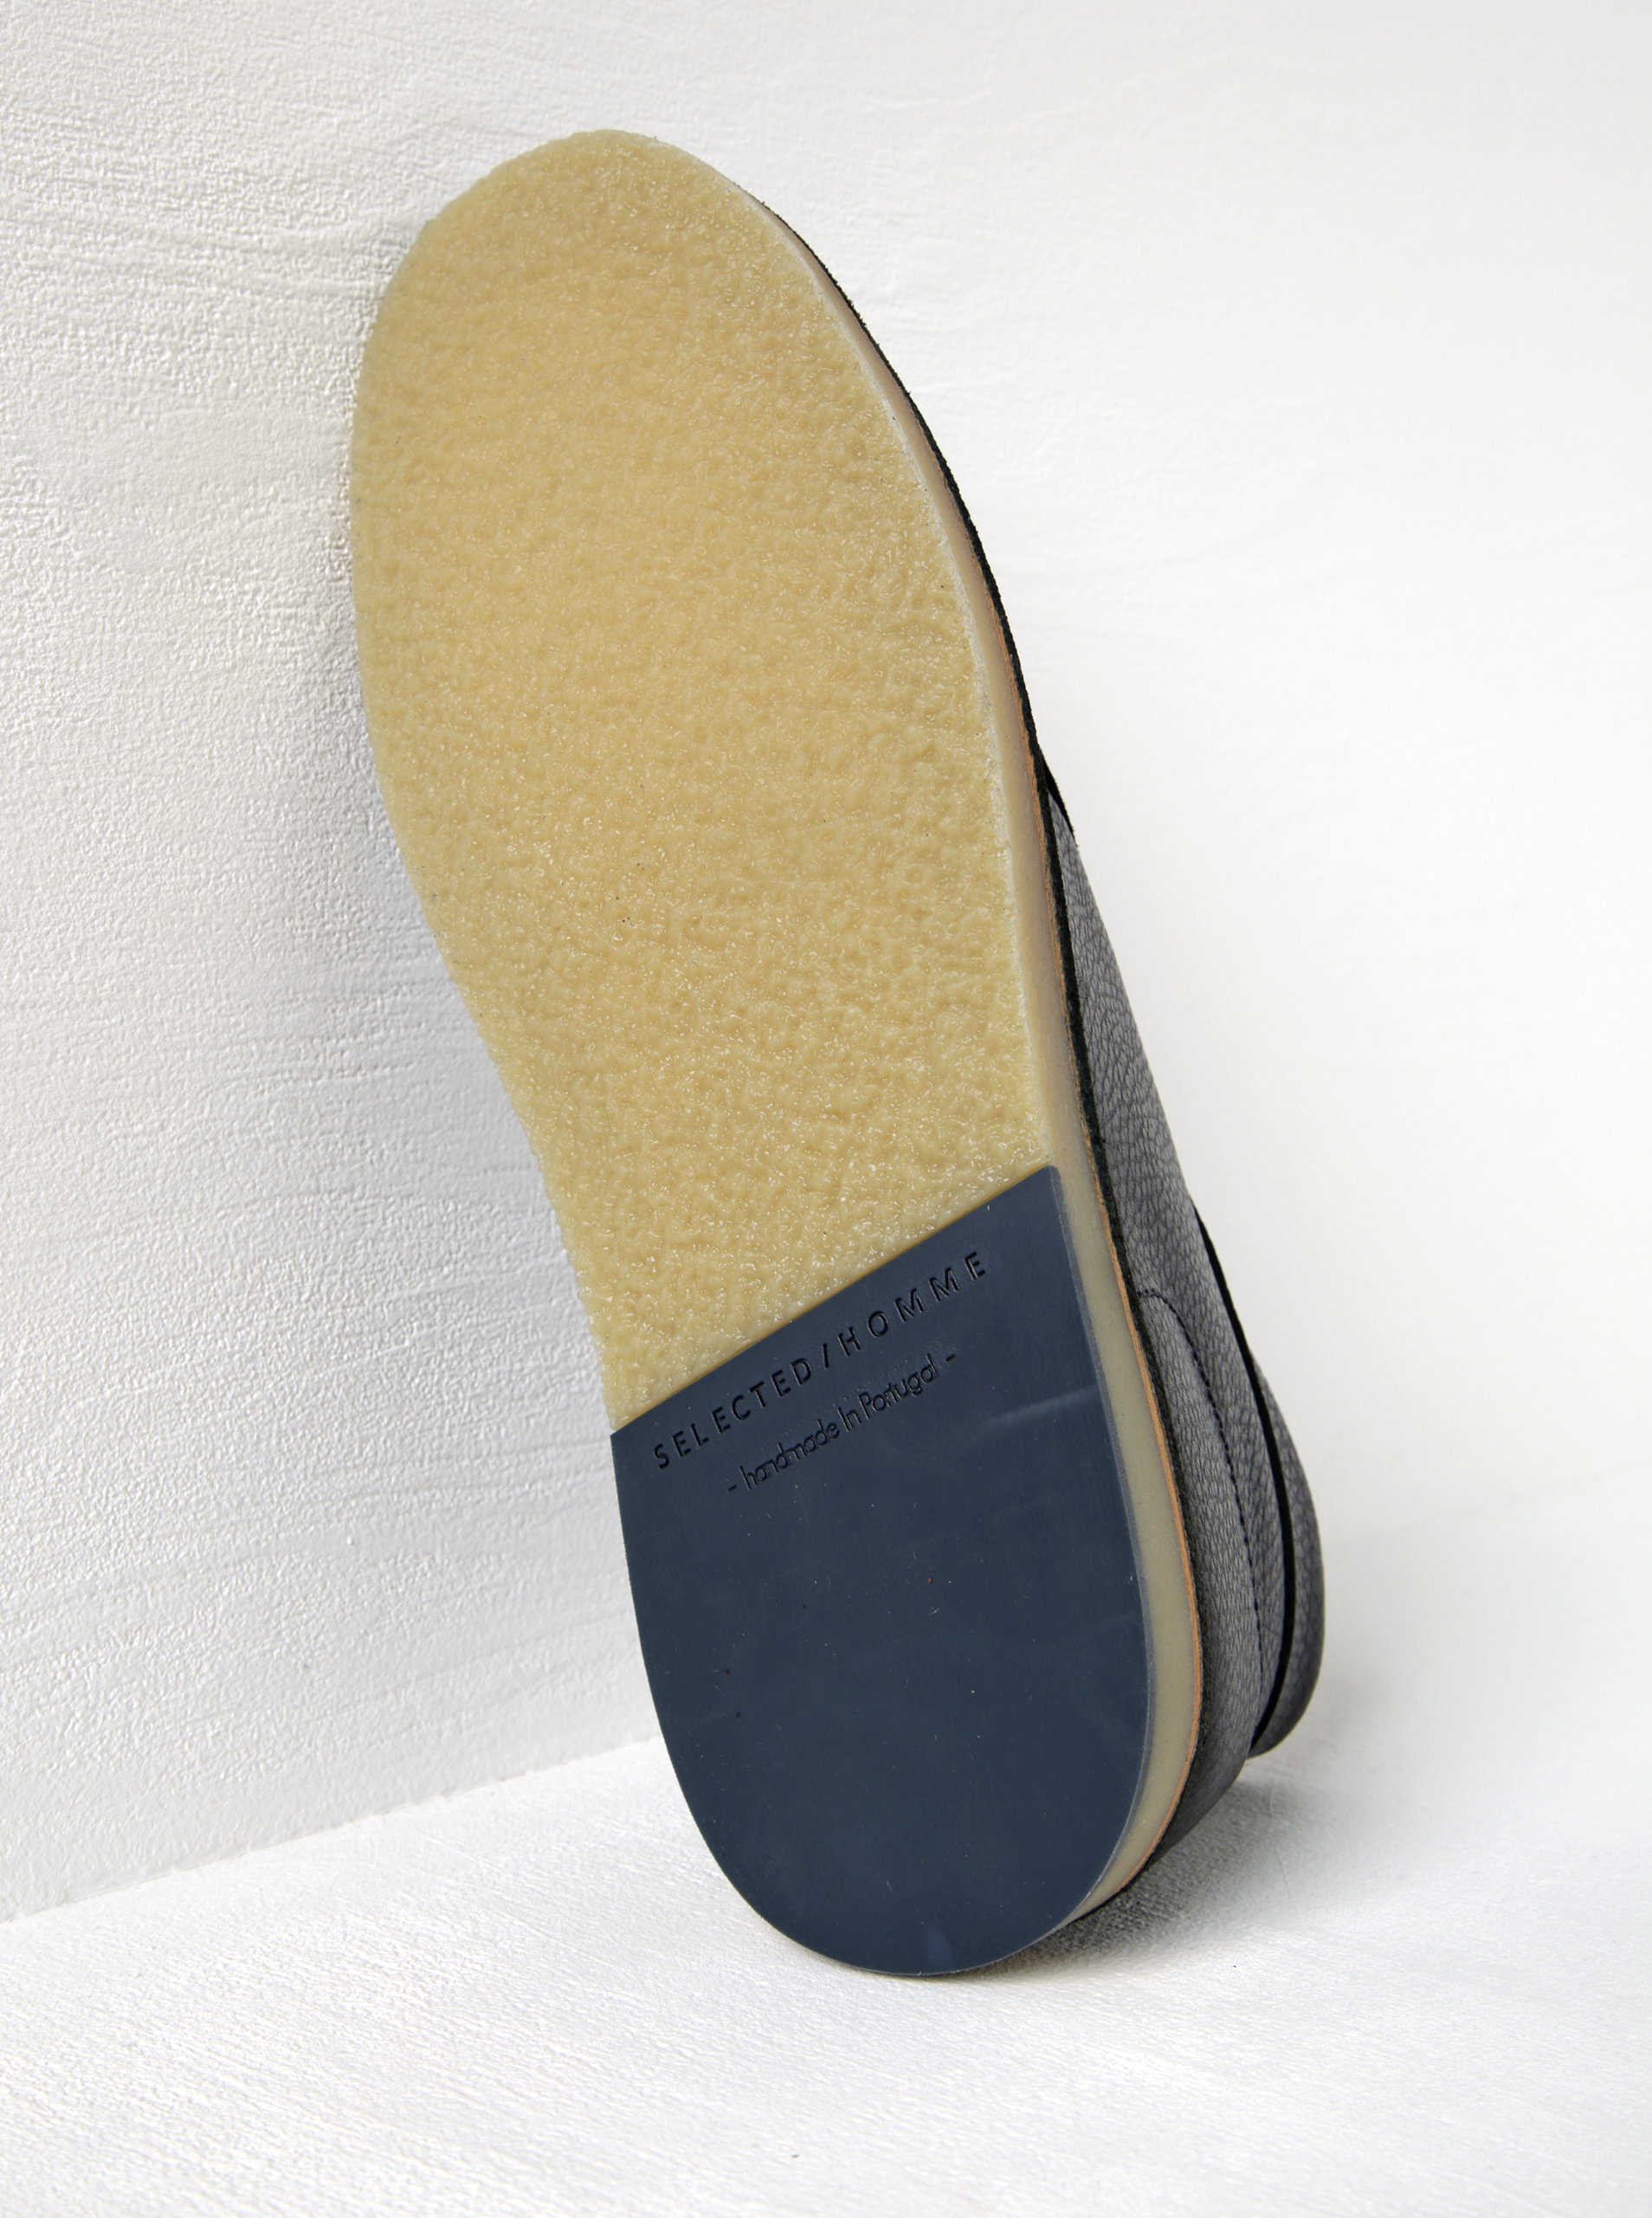 f3c7520500 Tmavomodré kožené členkové topánky Selected Homme Ronni ...